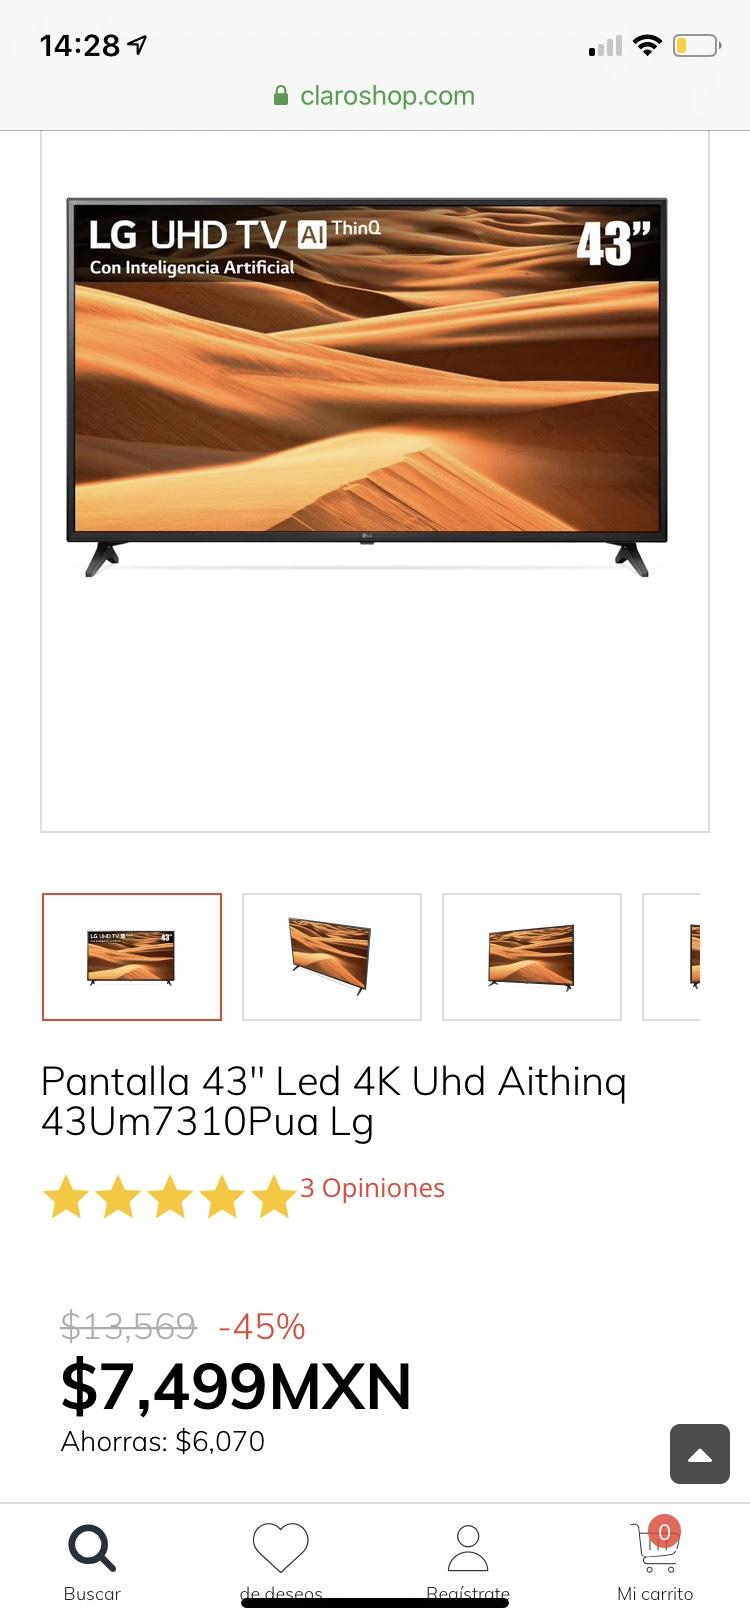 "Claro Shop LG Pantalla 43"" Led 4K Uhd Aithinq"